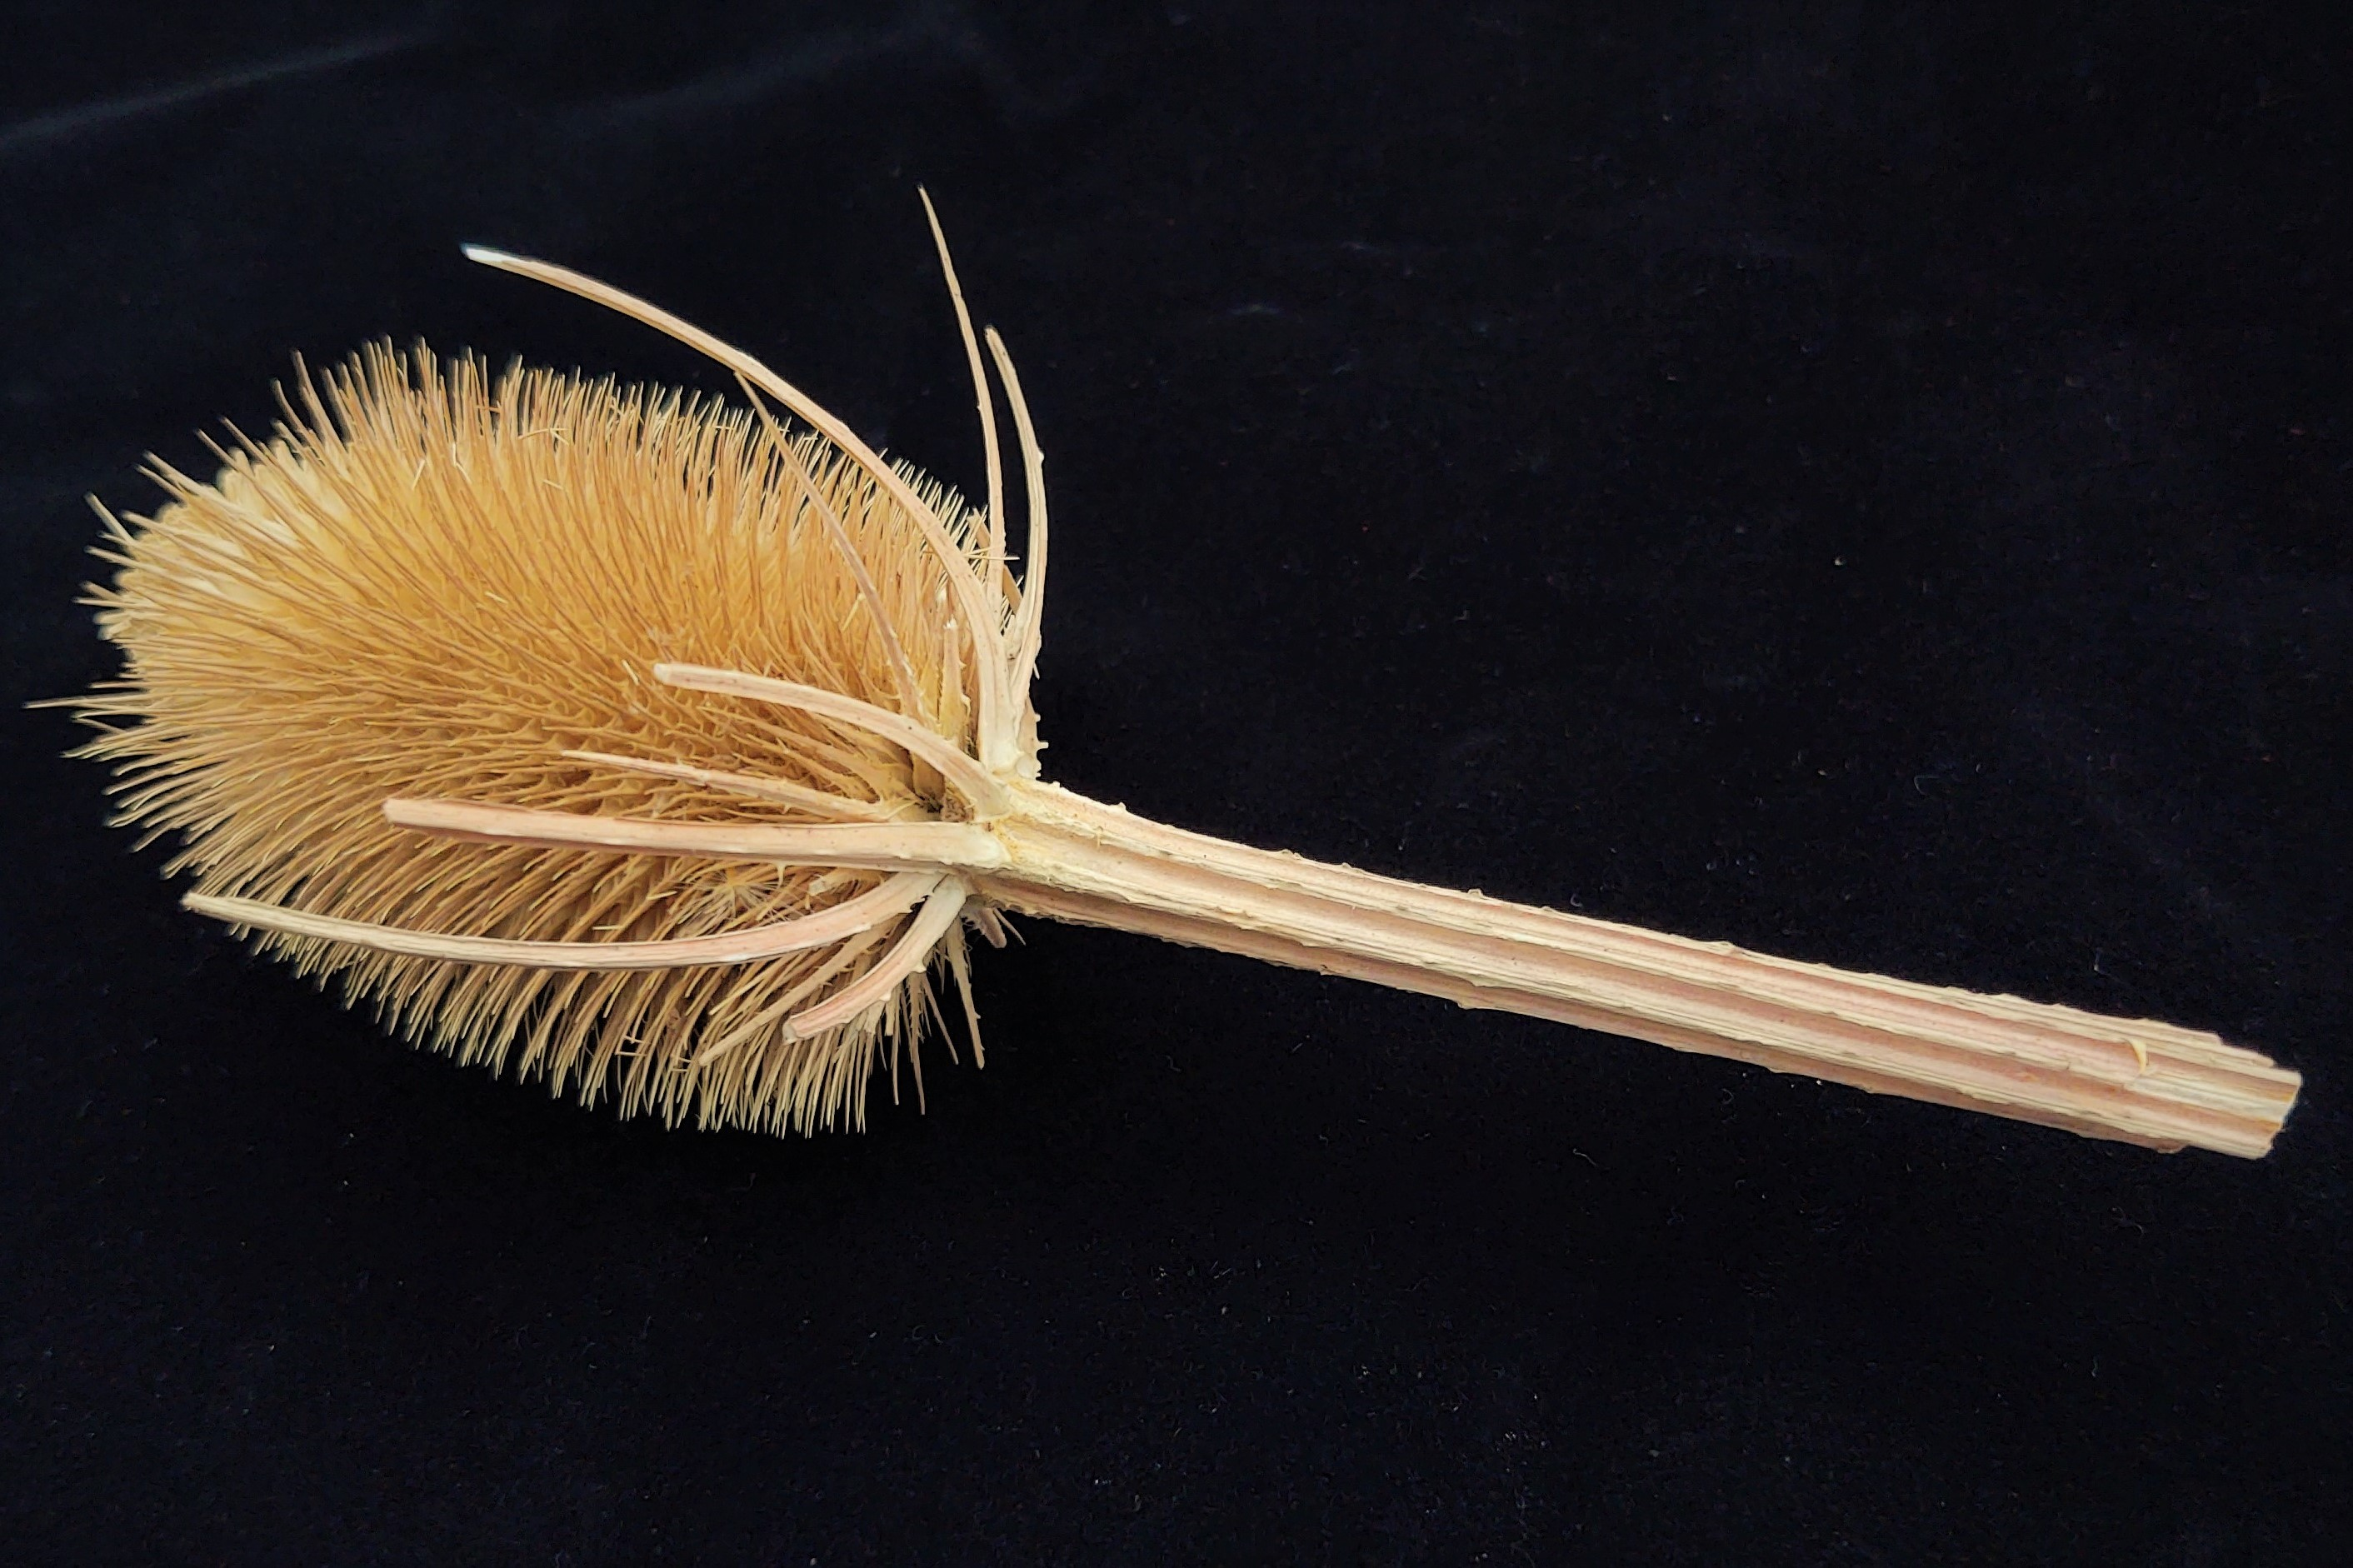 A prickly plant